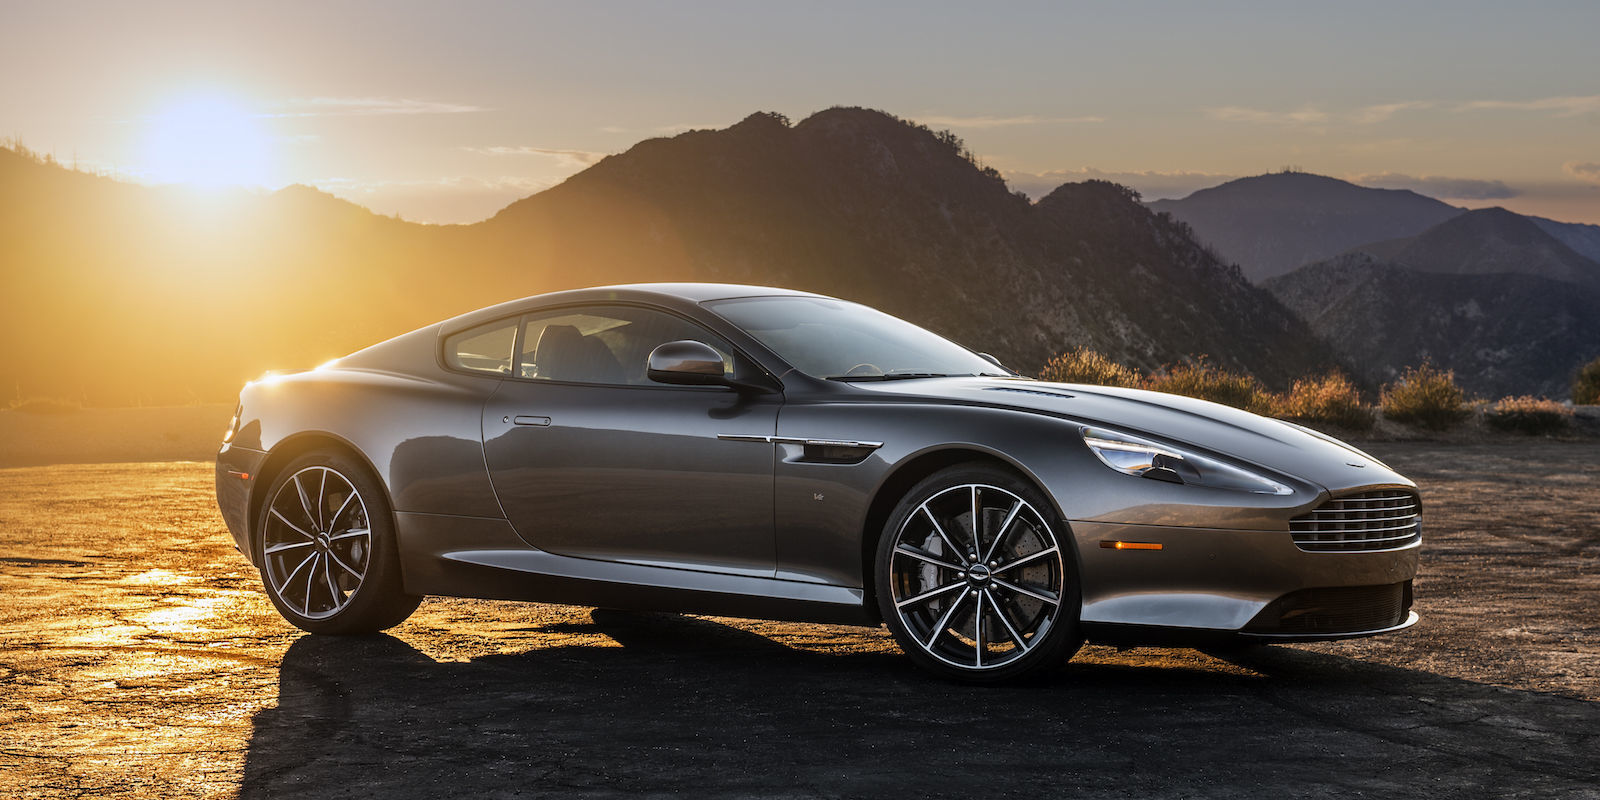 Aston Martin Db9, The Longlived Savior Of The Brand, Ends